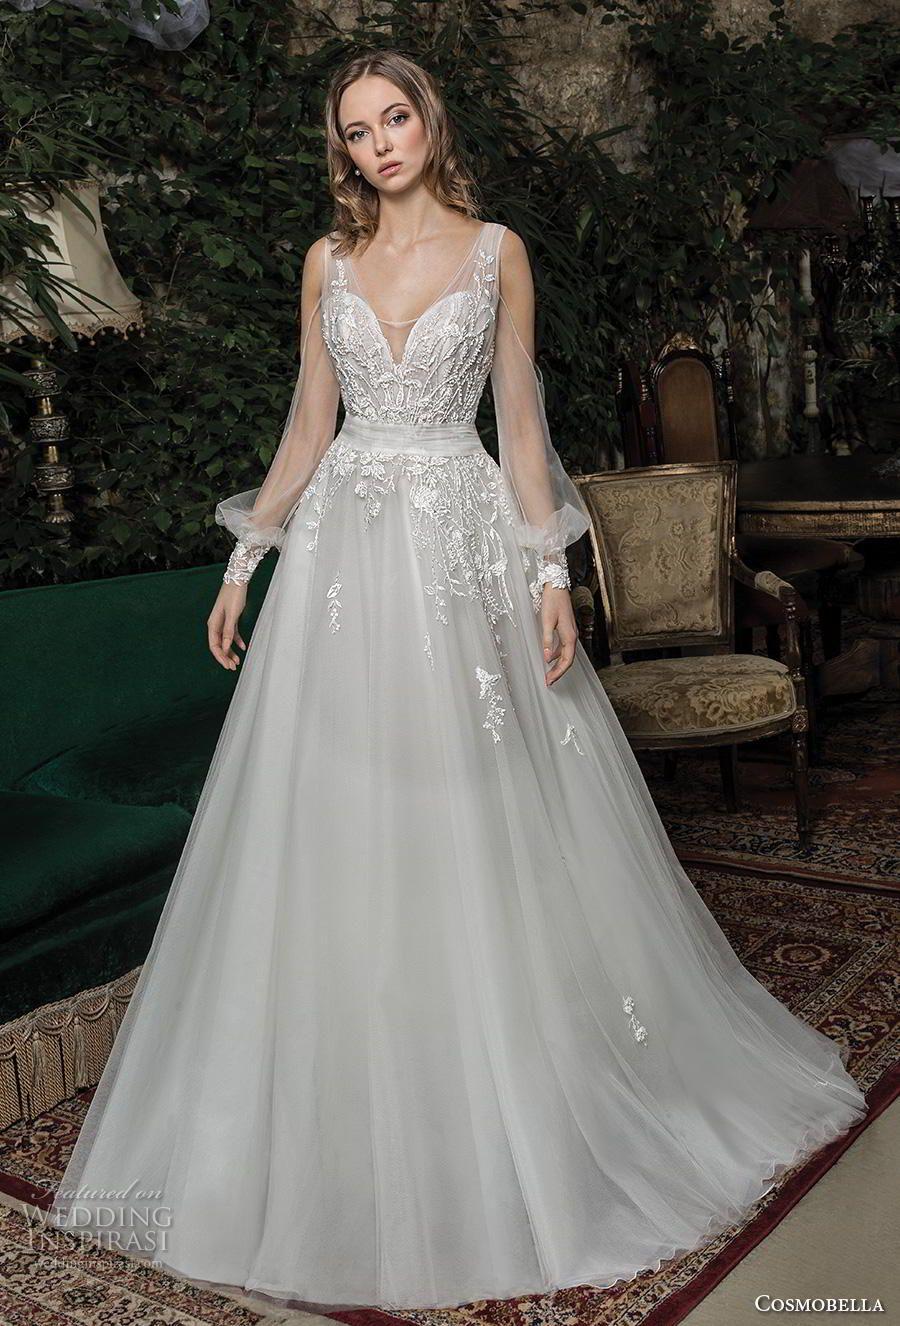 Cosmobella wedding dresses wedding dress pinterest